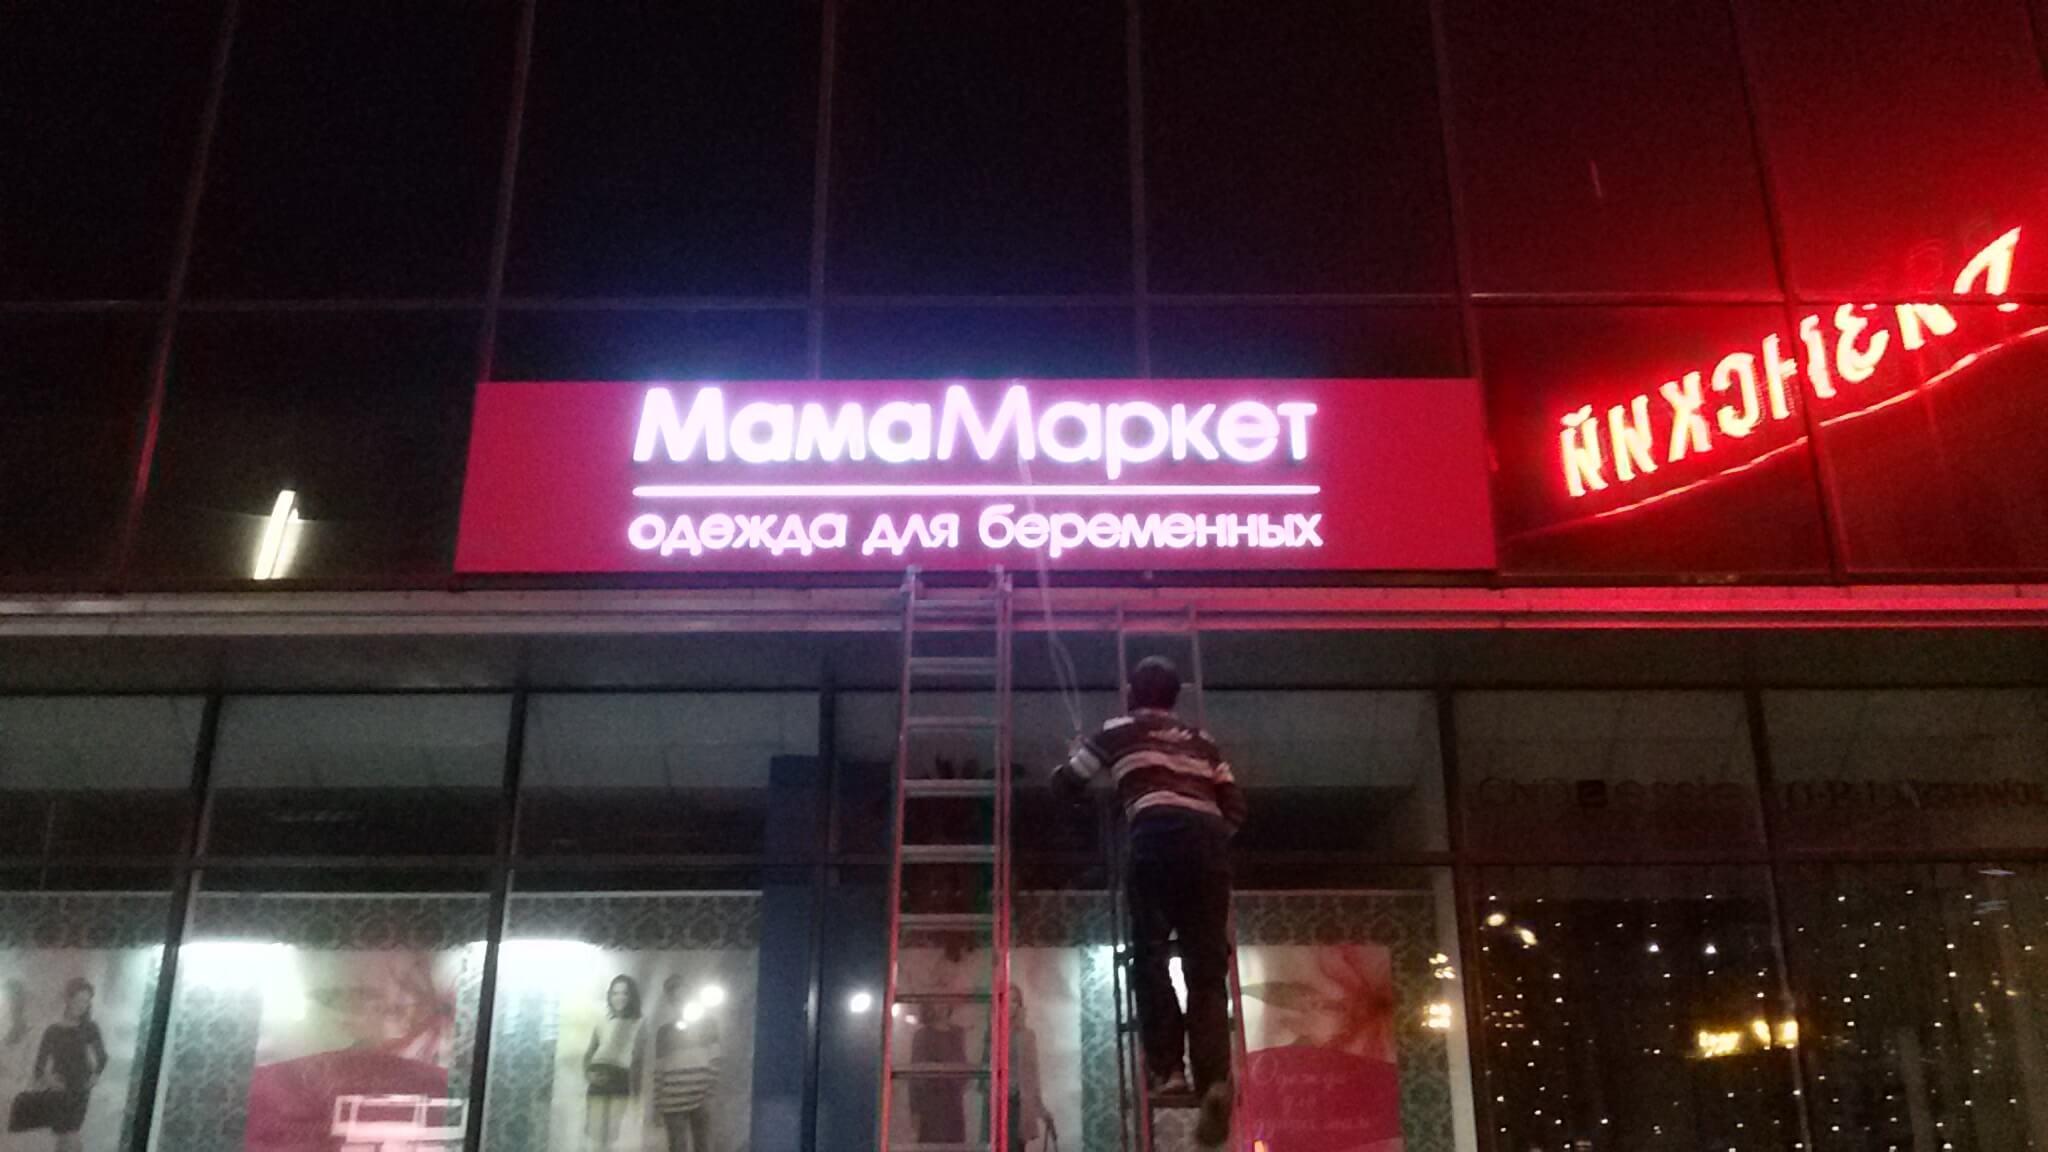 komprozitnyii-korob-s-inkrustatsiei-i-svetovyimi-bukvami